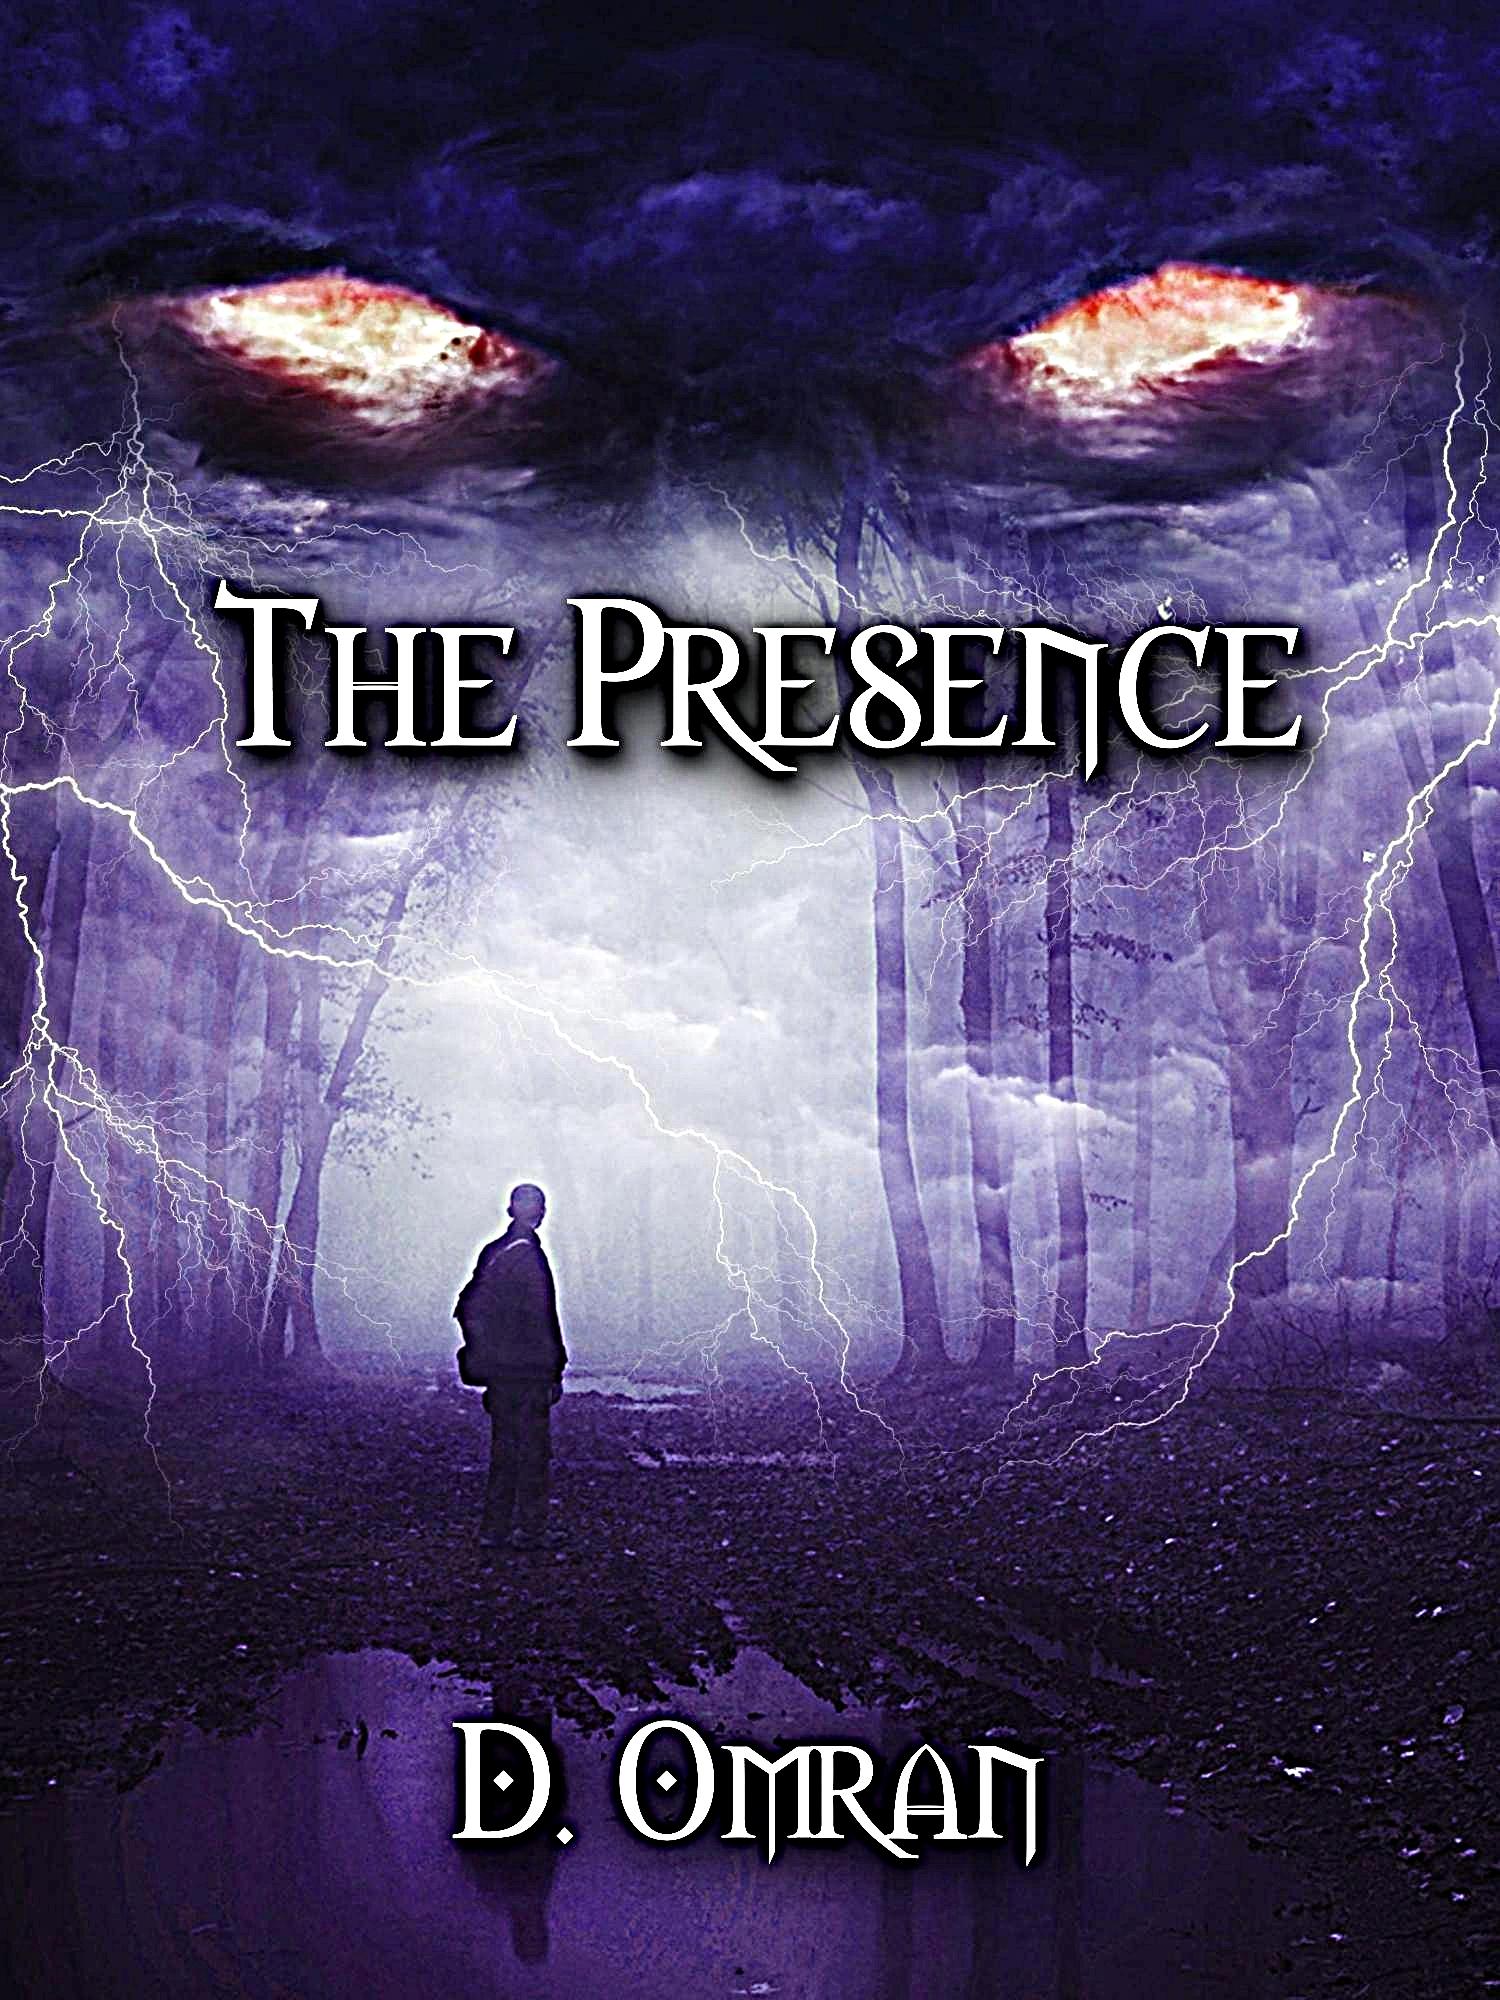 Paranormal Horror/Thriller